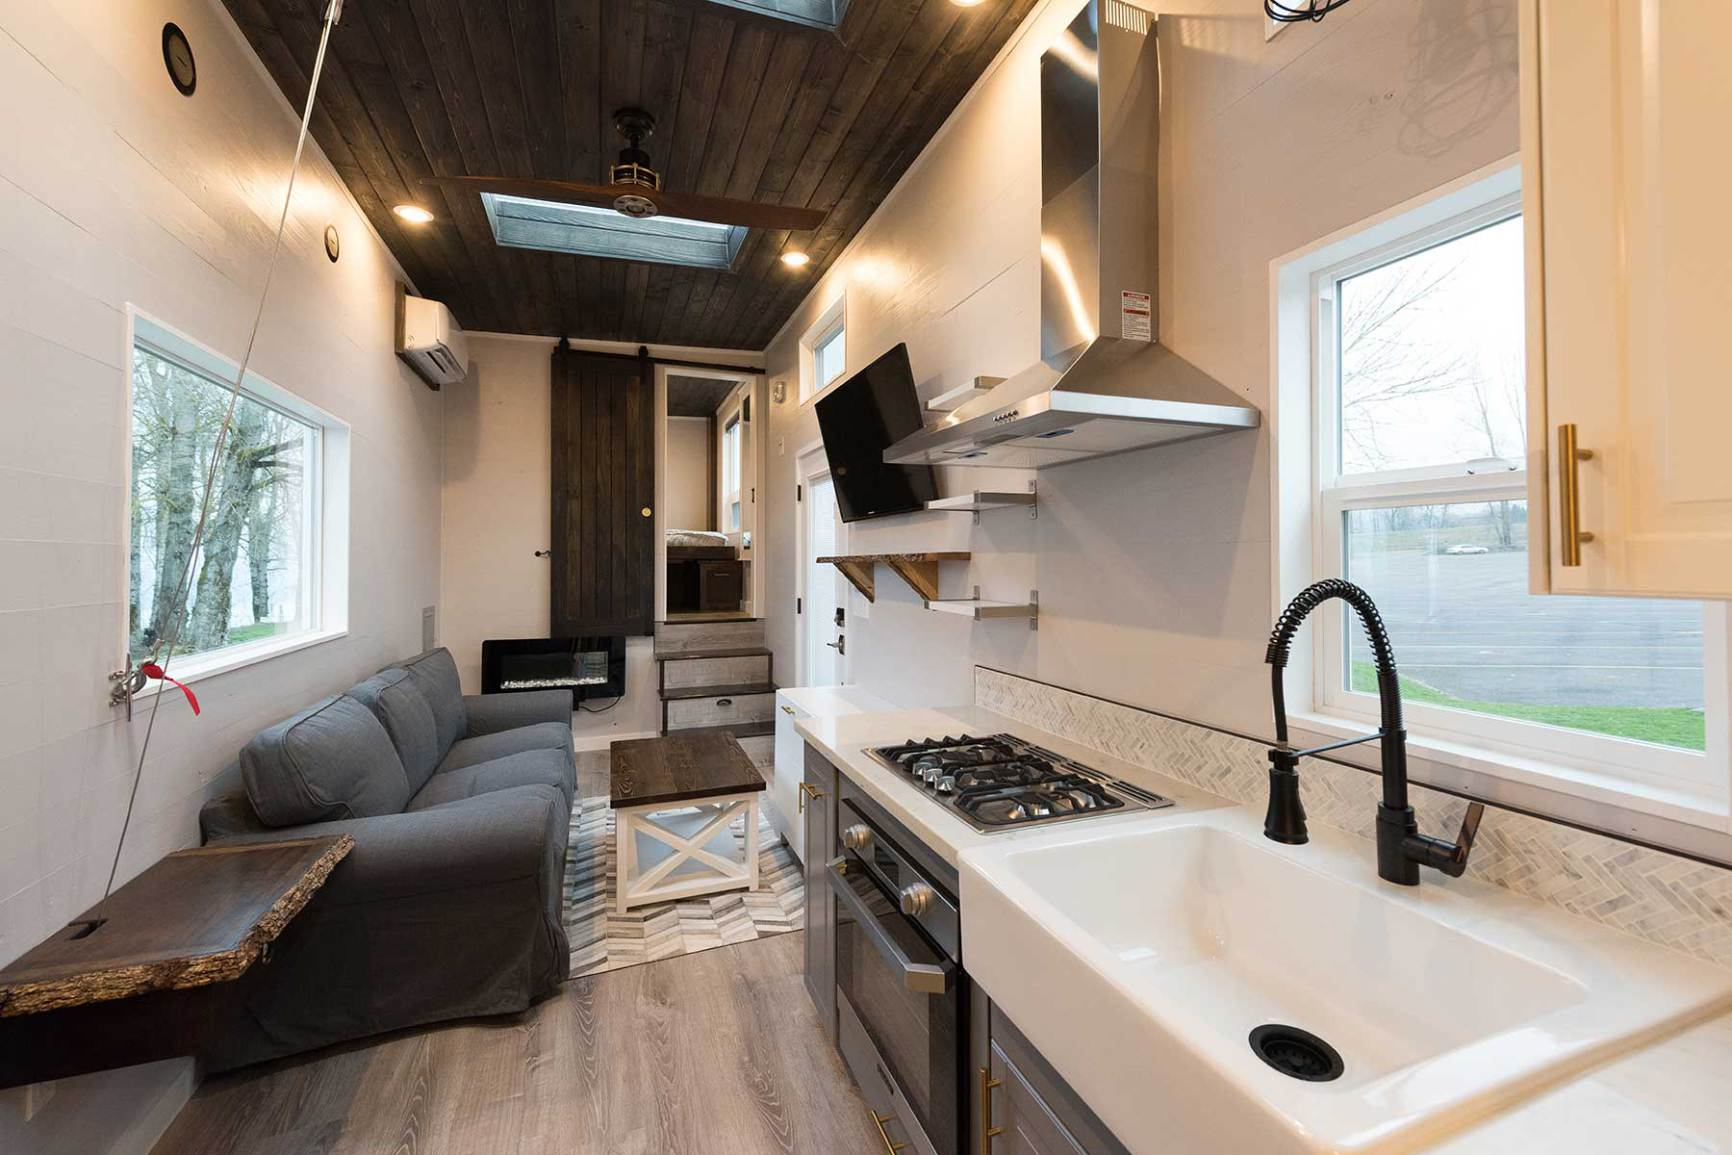 cayman_interior_kitchen_living_room.jpg